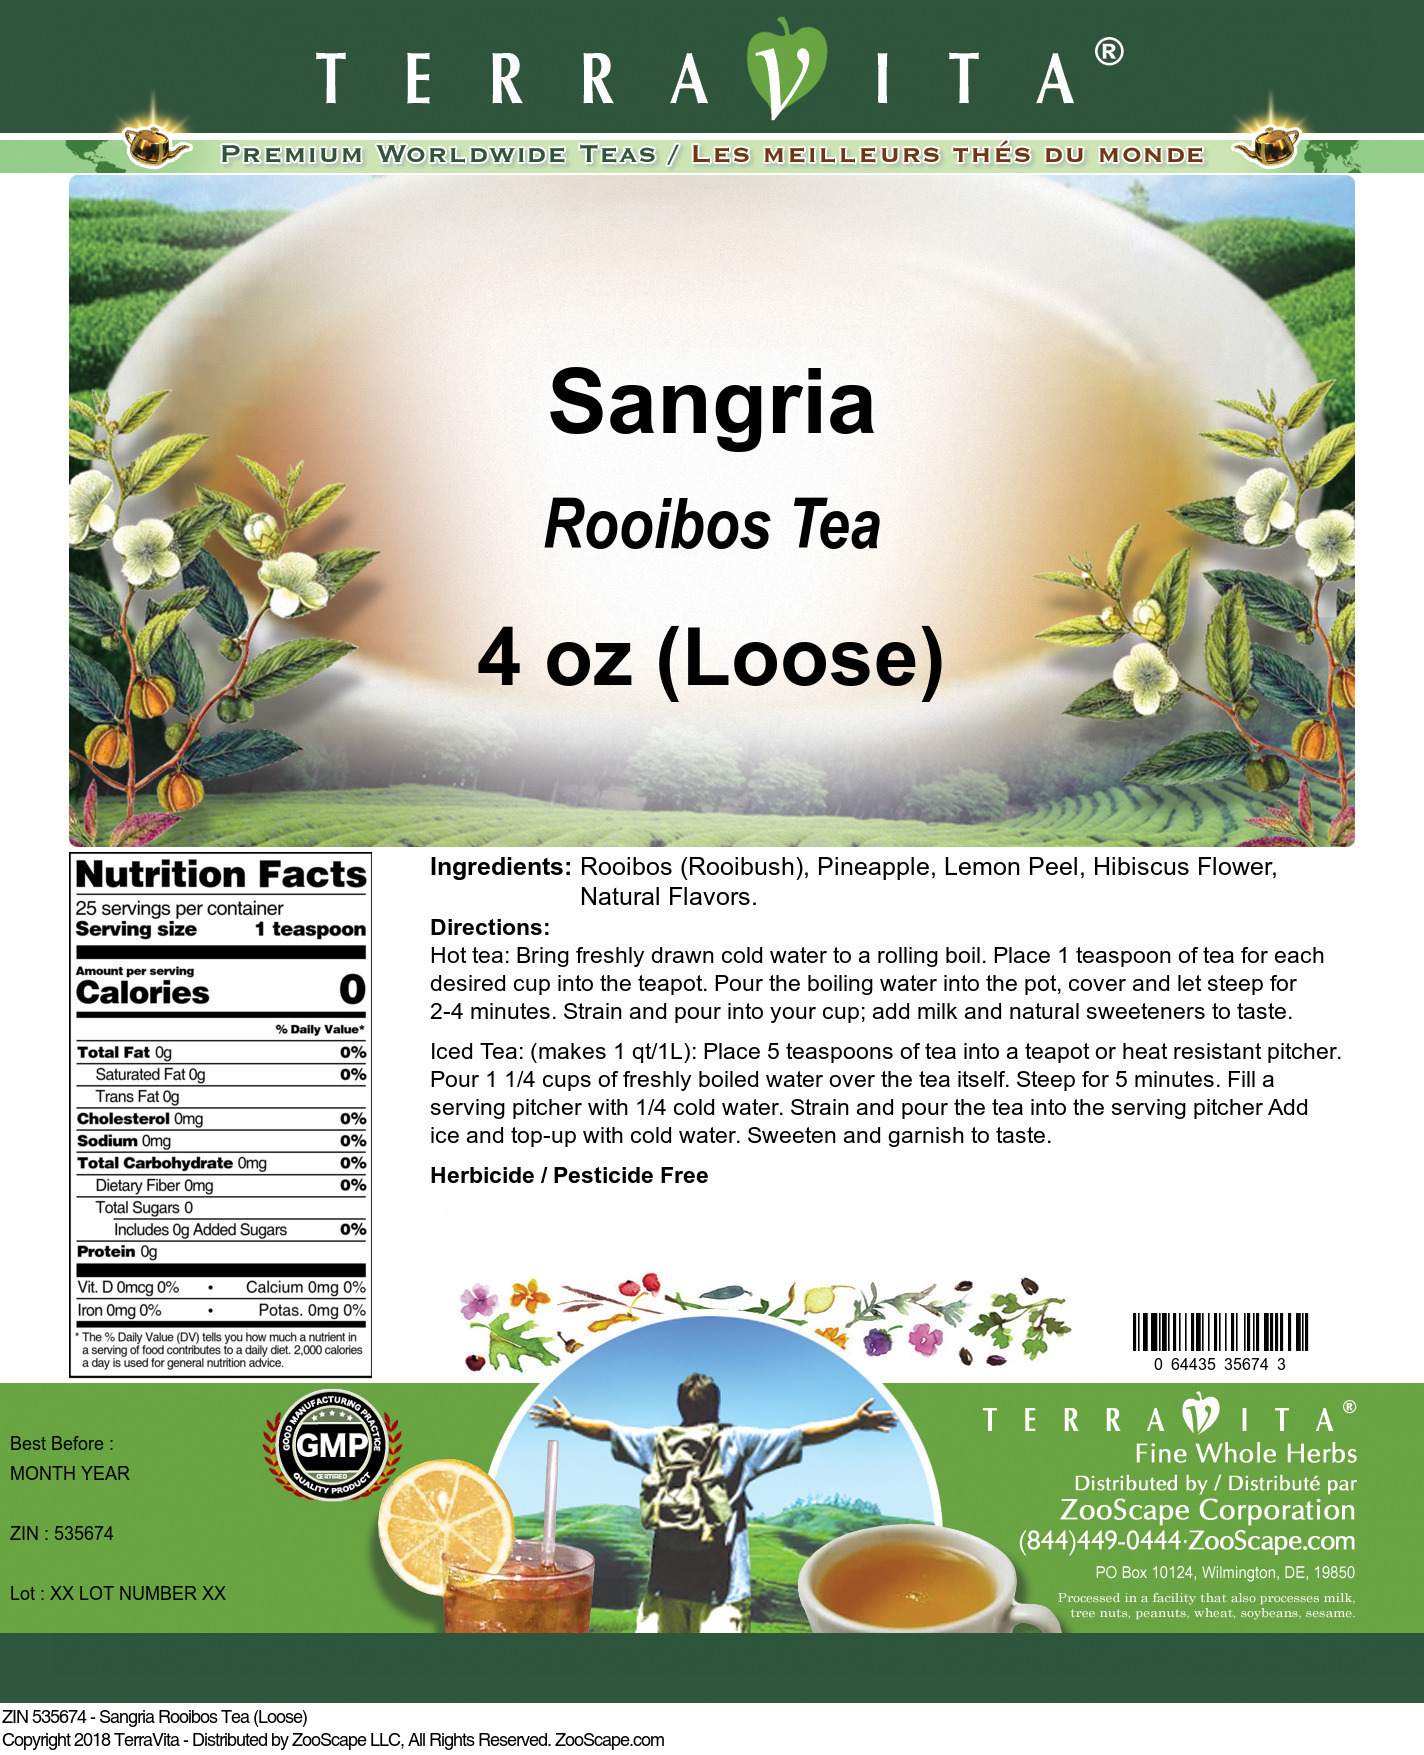 Sangria Rooibos Tea (Loose)